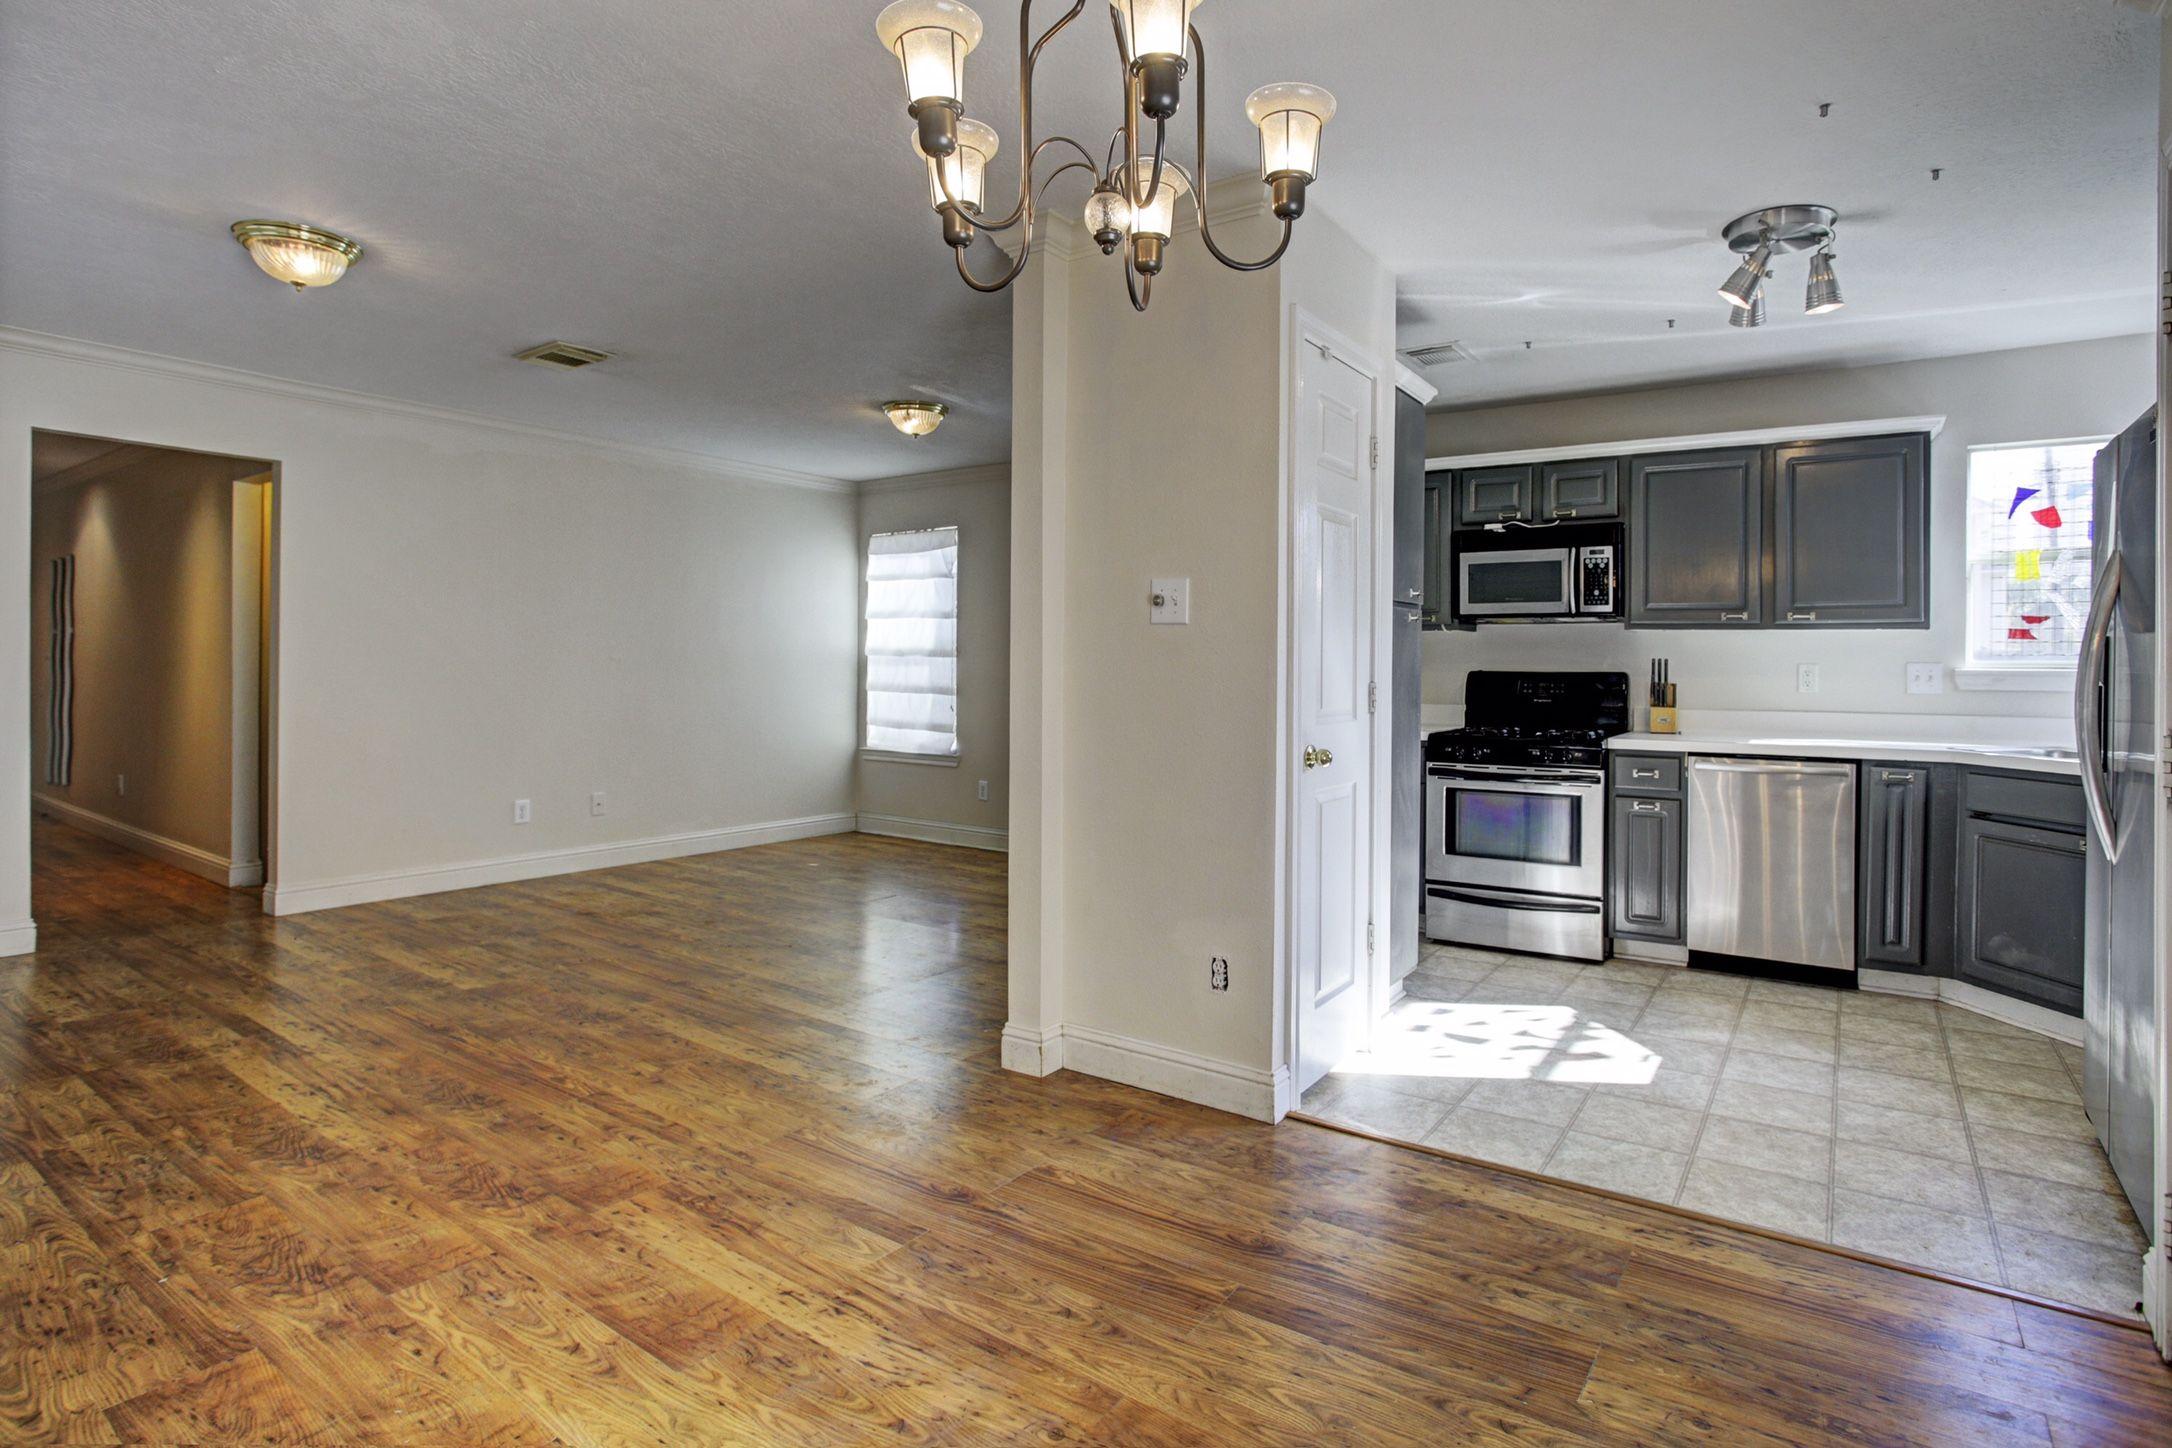 Pin By Tara Bowles On 1309 Ruthven Houston Tx 77019 Kitchen Upstairs Wood Laminate Flooring Wood Laminate